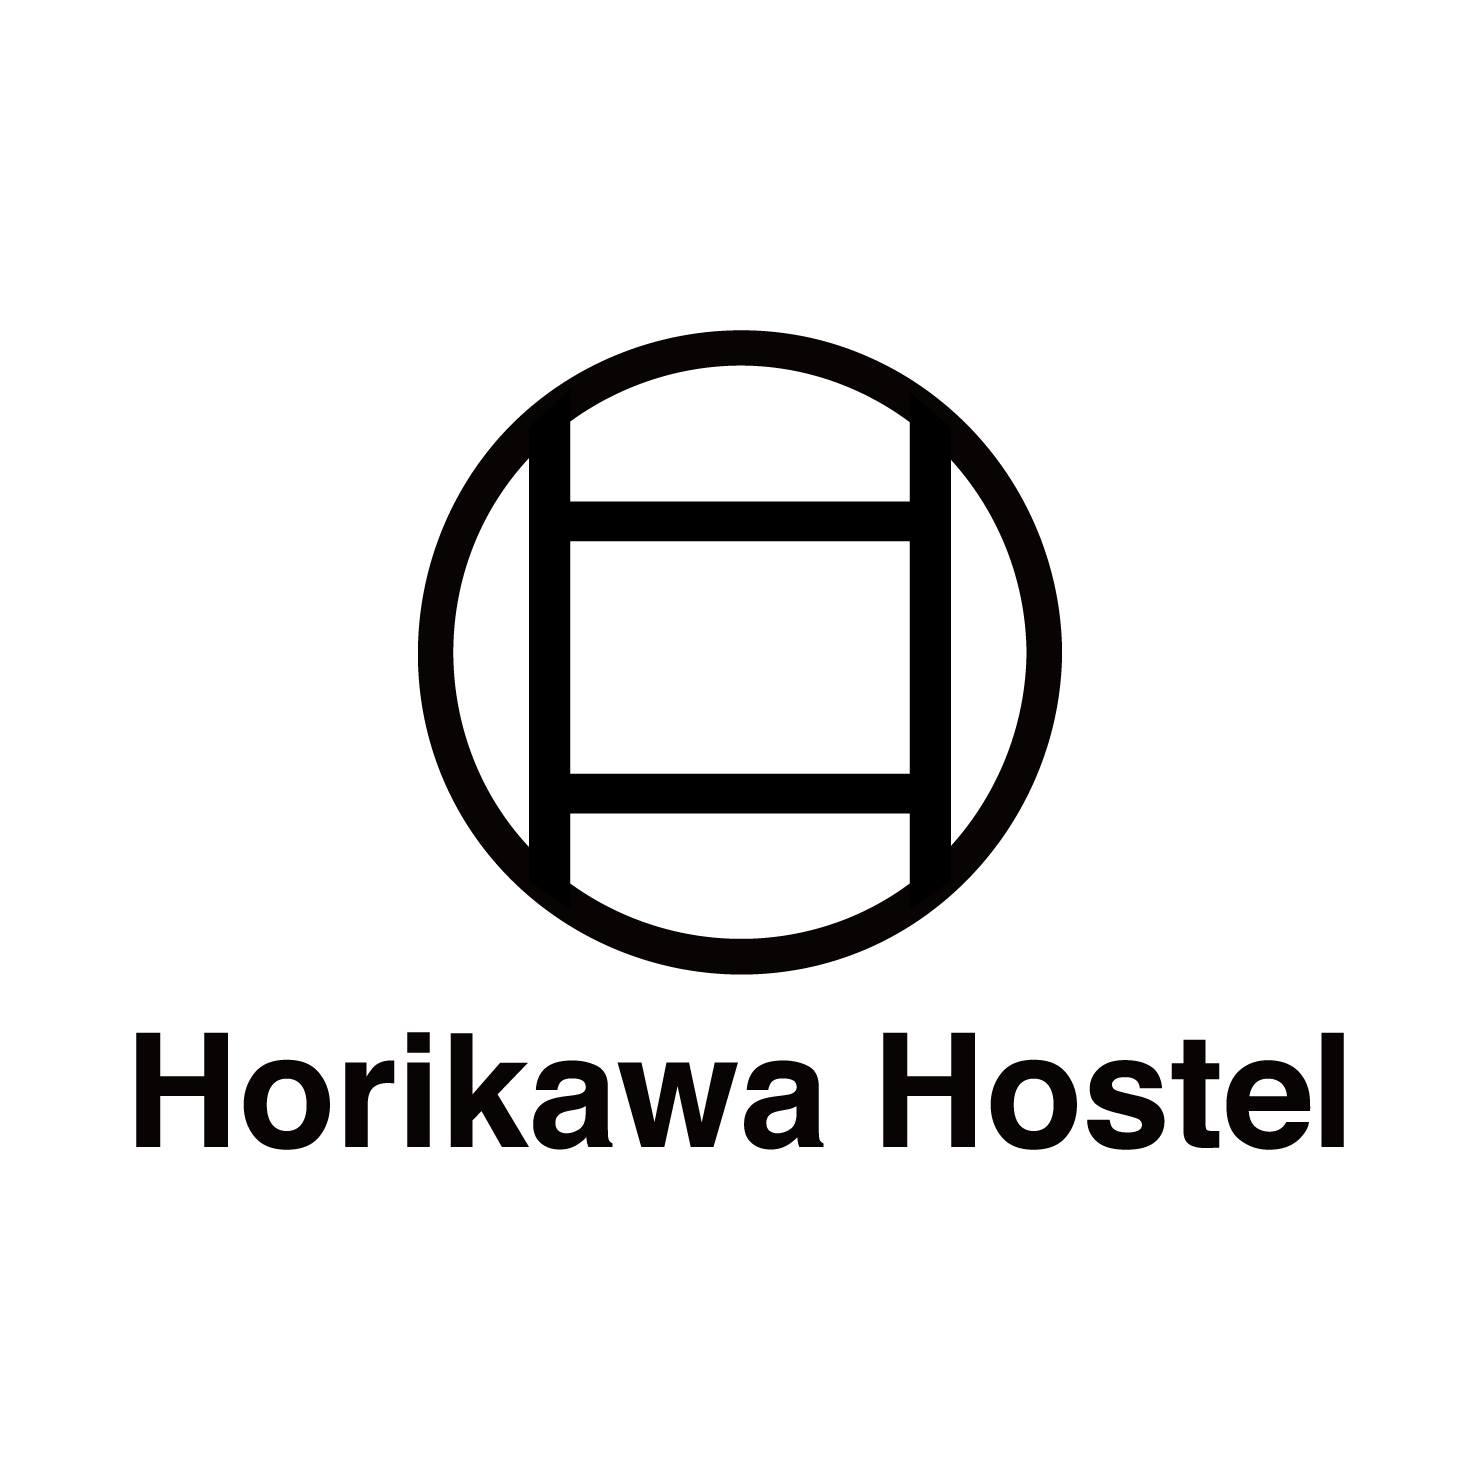 Horikawa Hostel